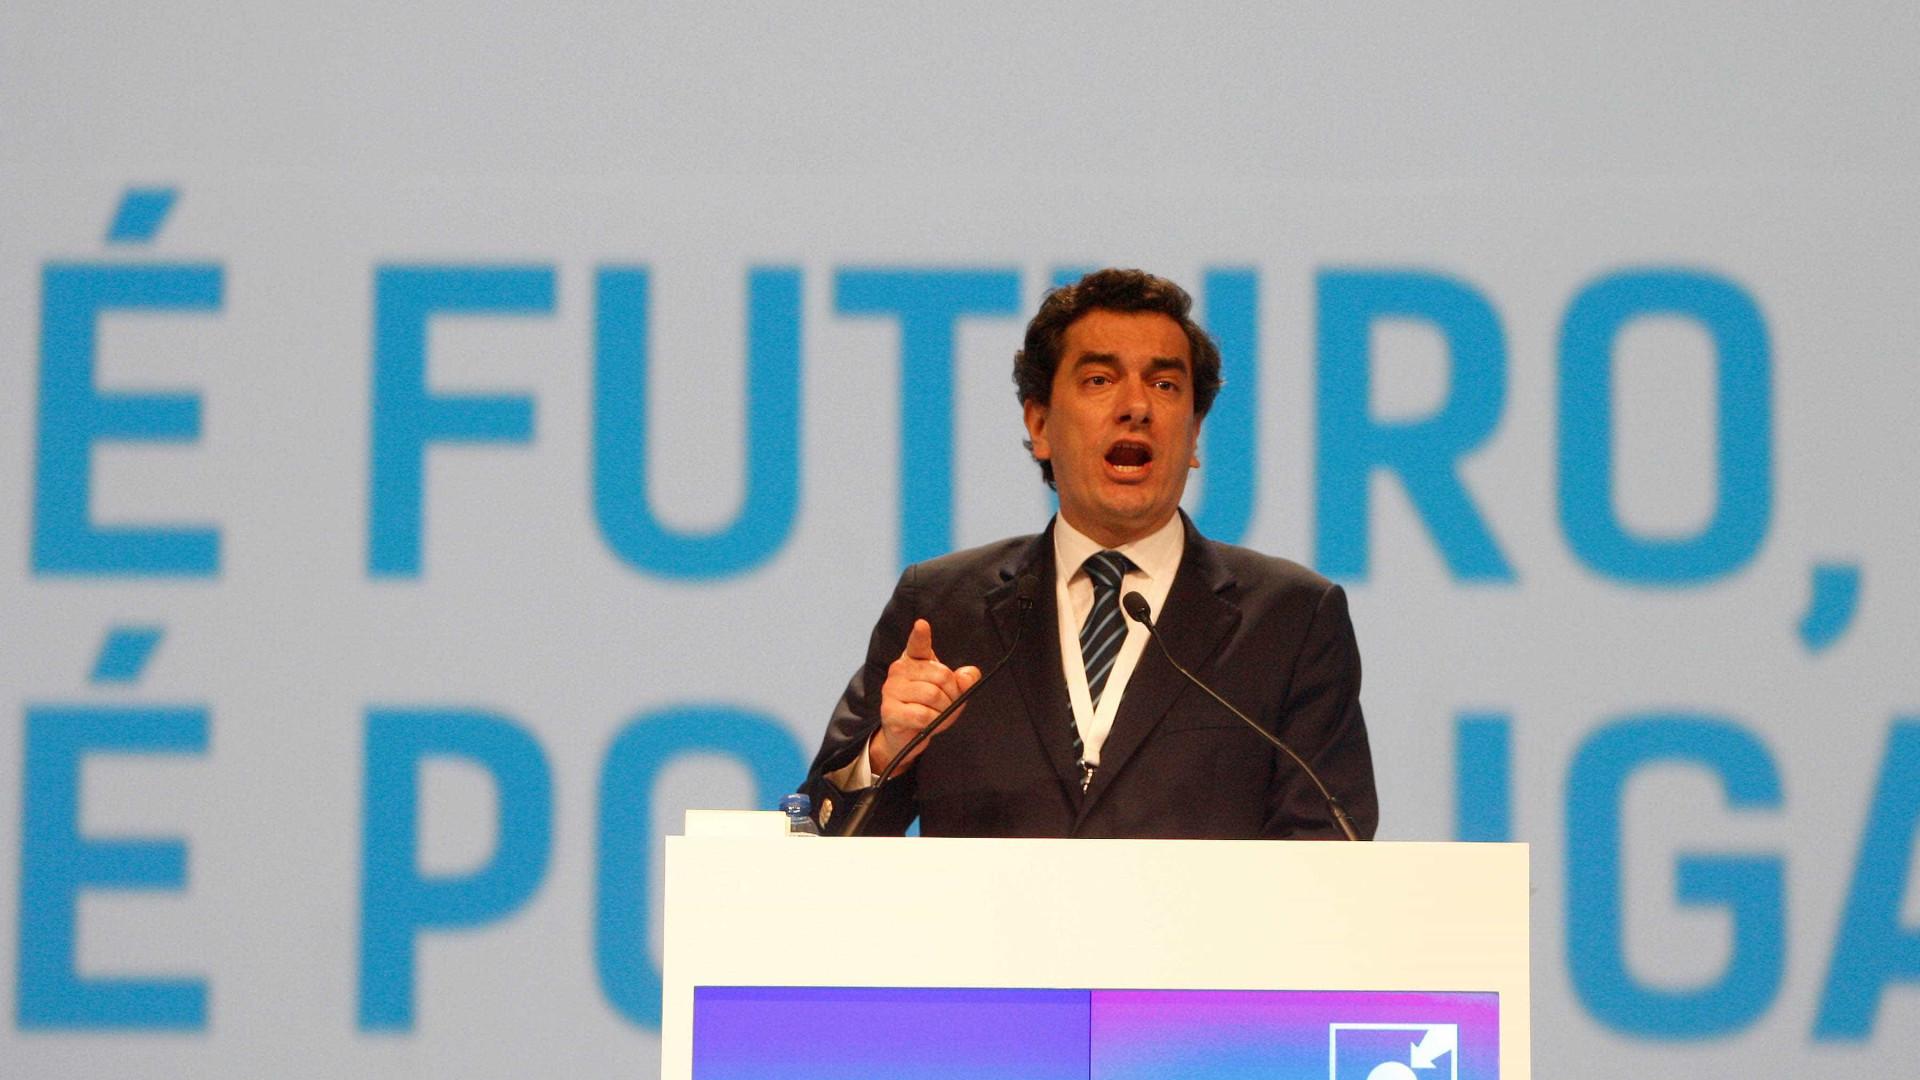 Cristas anuncia recandidatura de Nuno Melo às europeias